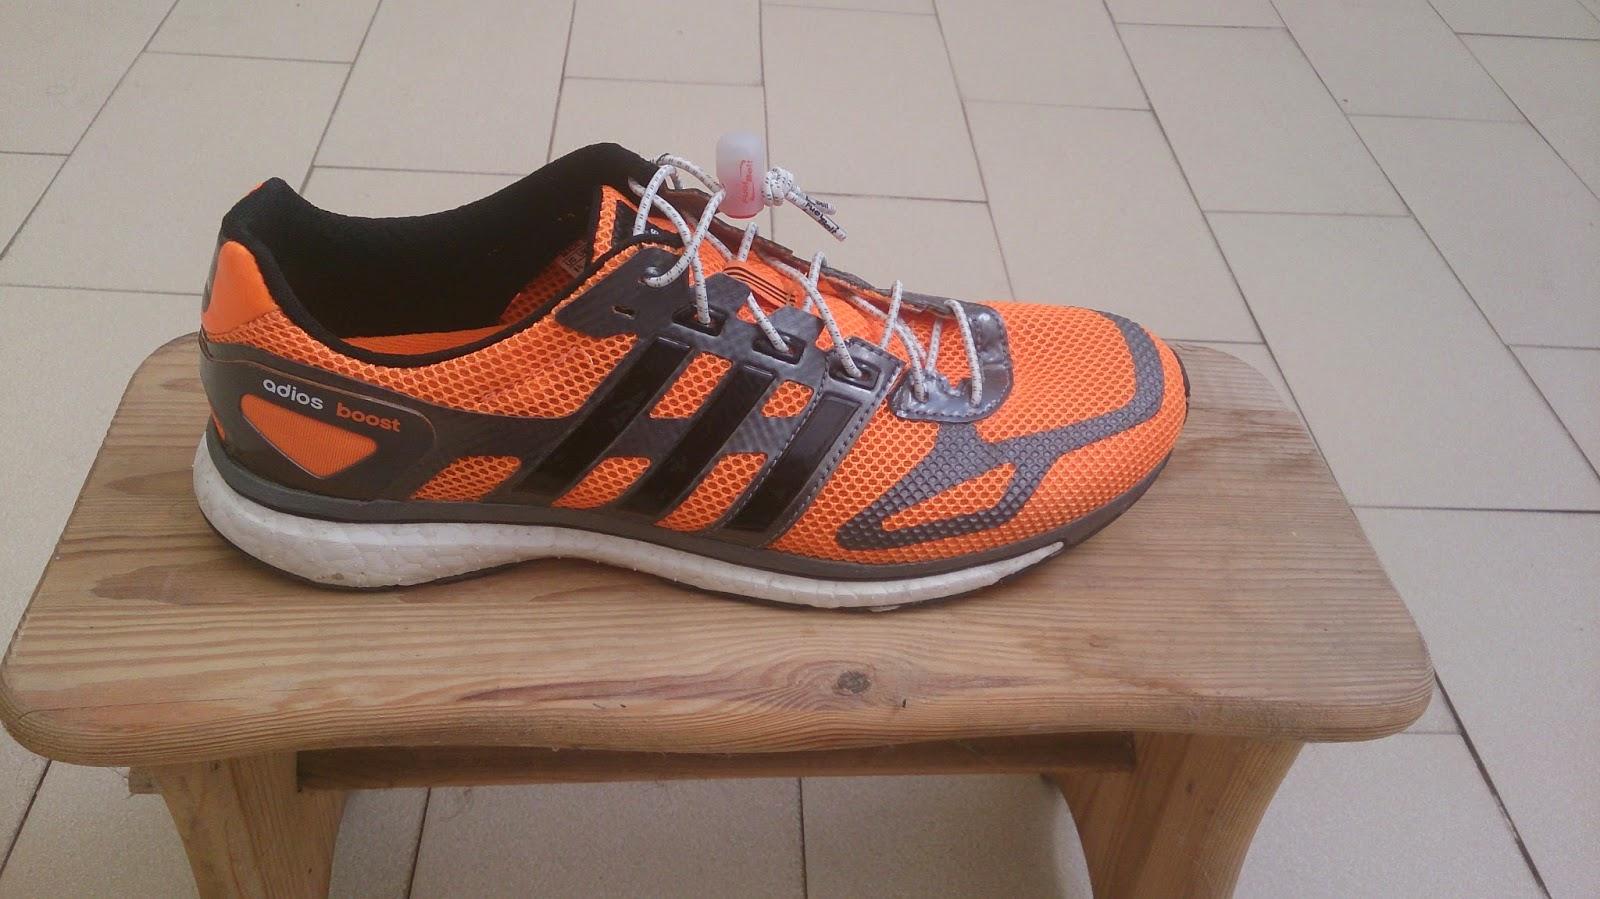 new product 991fd 45a45 ... australia zapatilla running adidas adizero adios boost 14551 a5093